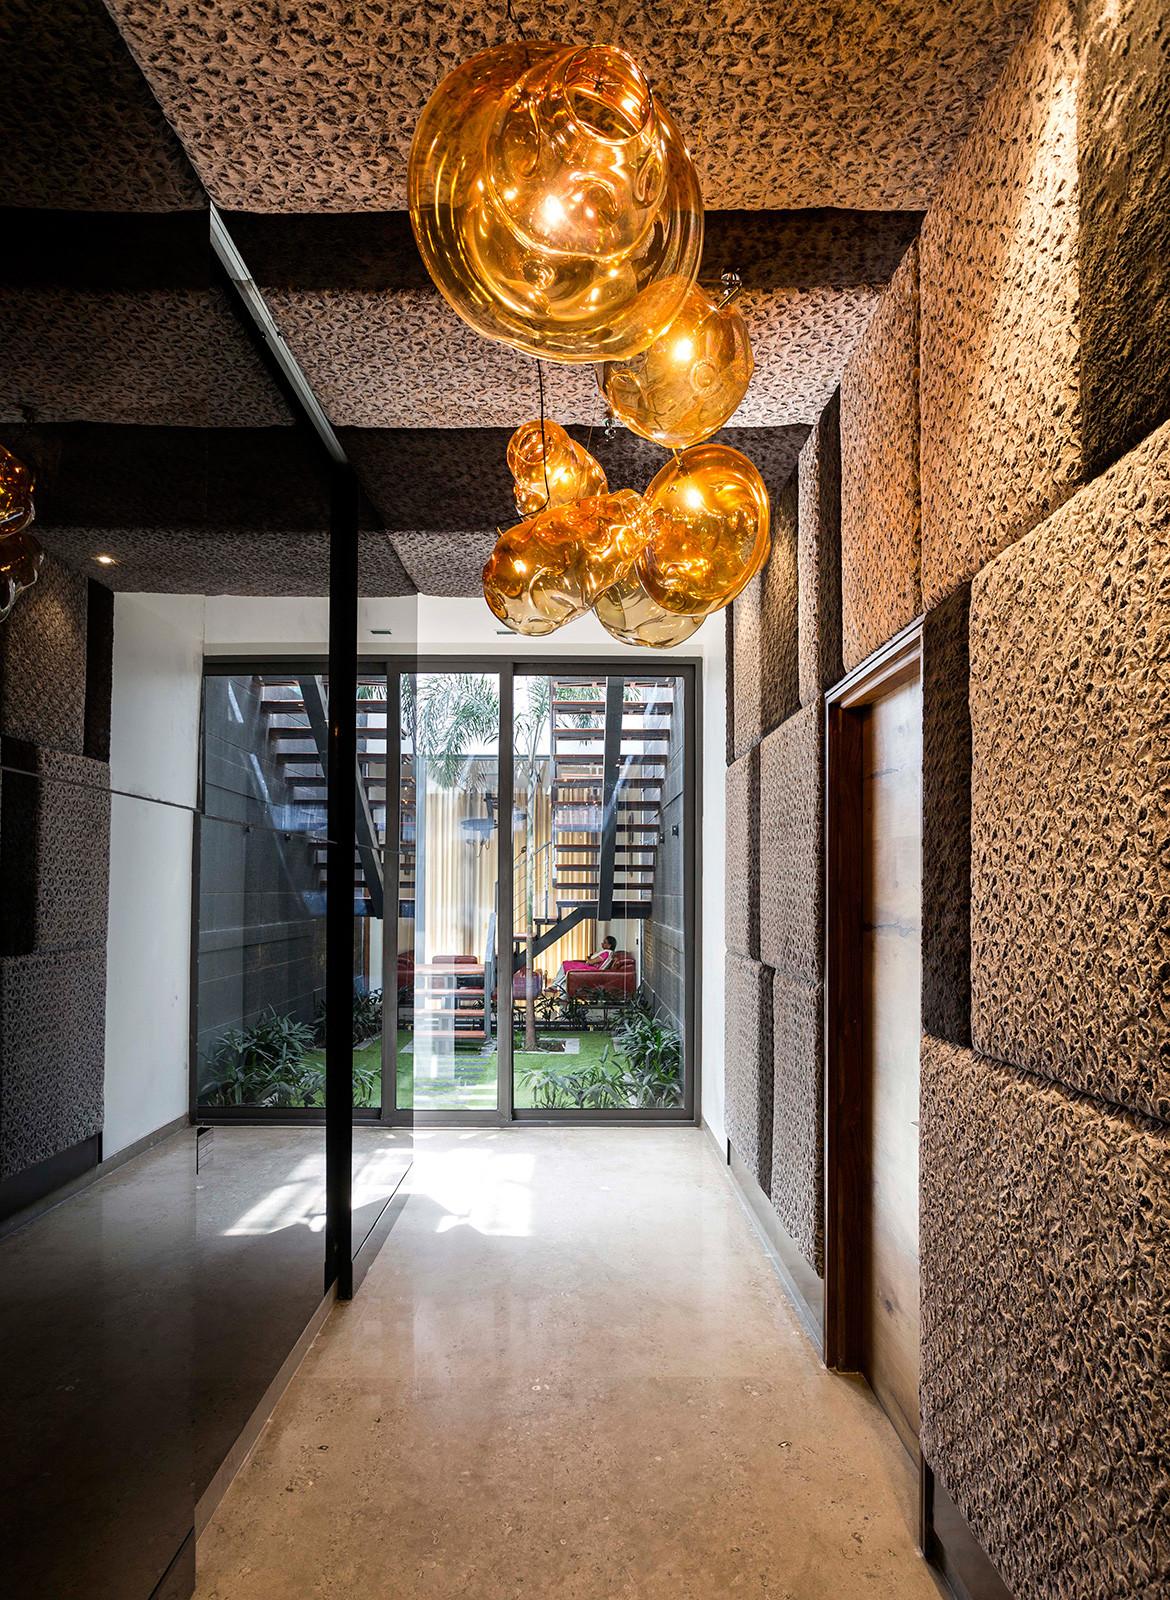 Pool Yard House Studio Ardete CC Purdesh Dev Nikhanj hallway and lighting features